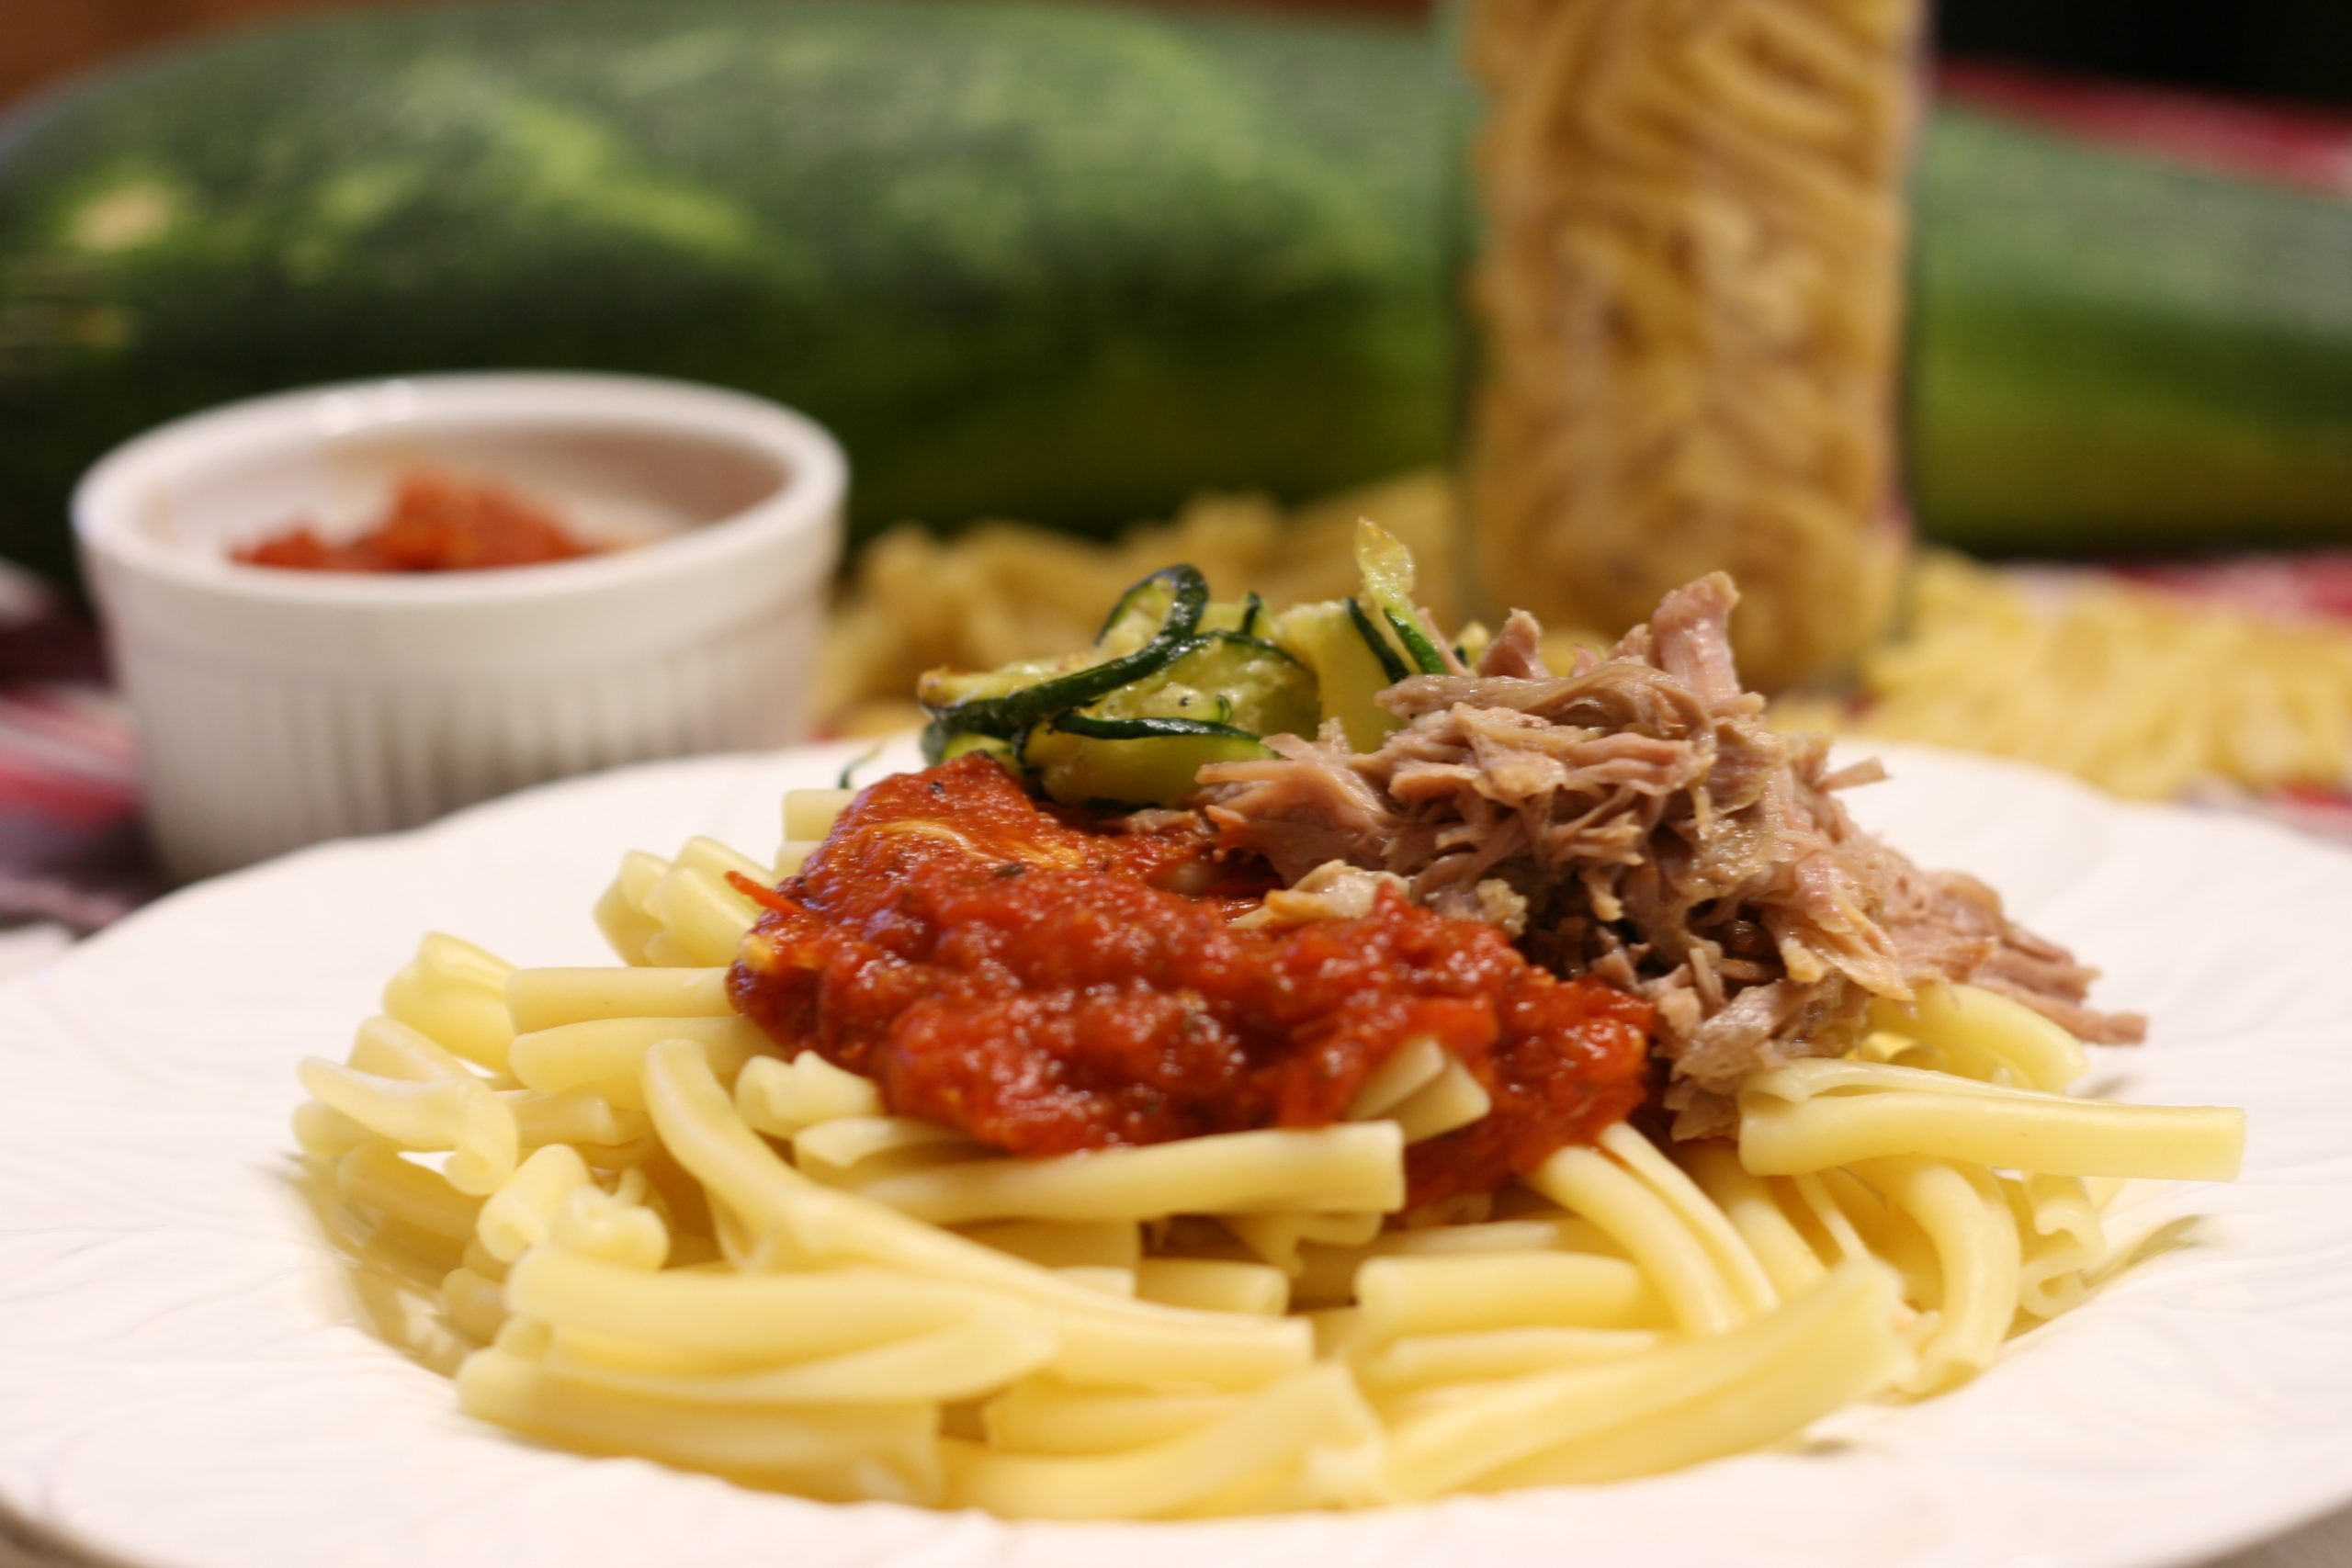 Zucchini pork and roasted garlic pasta sauce